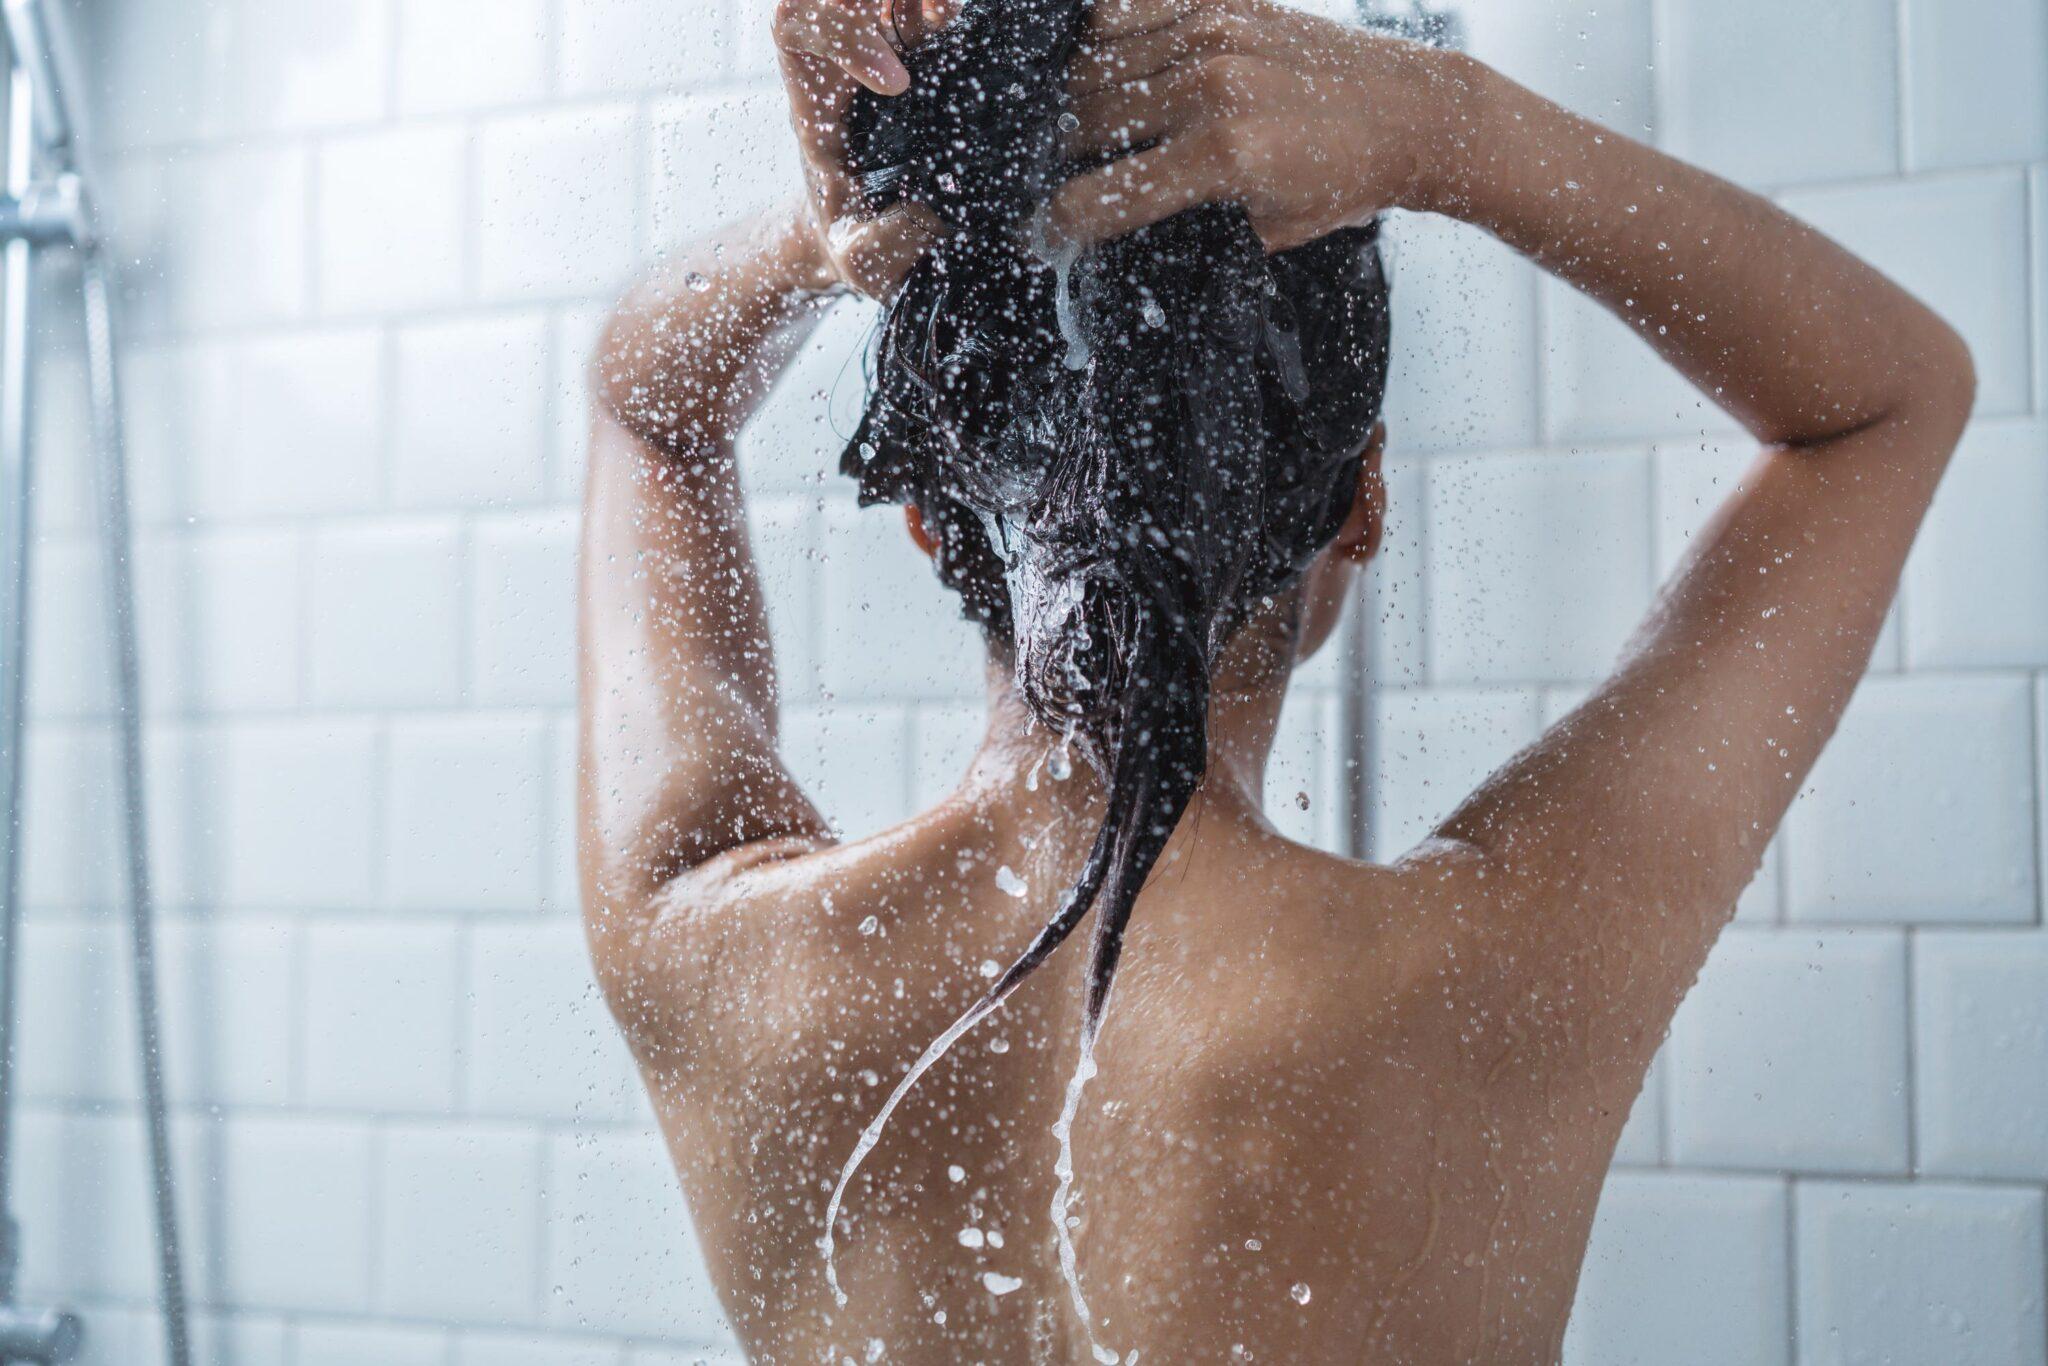 woman showers